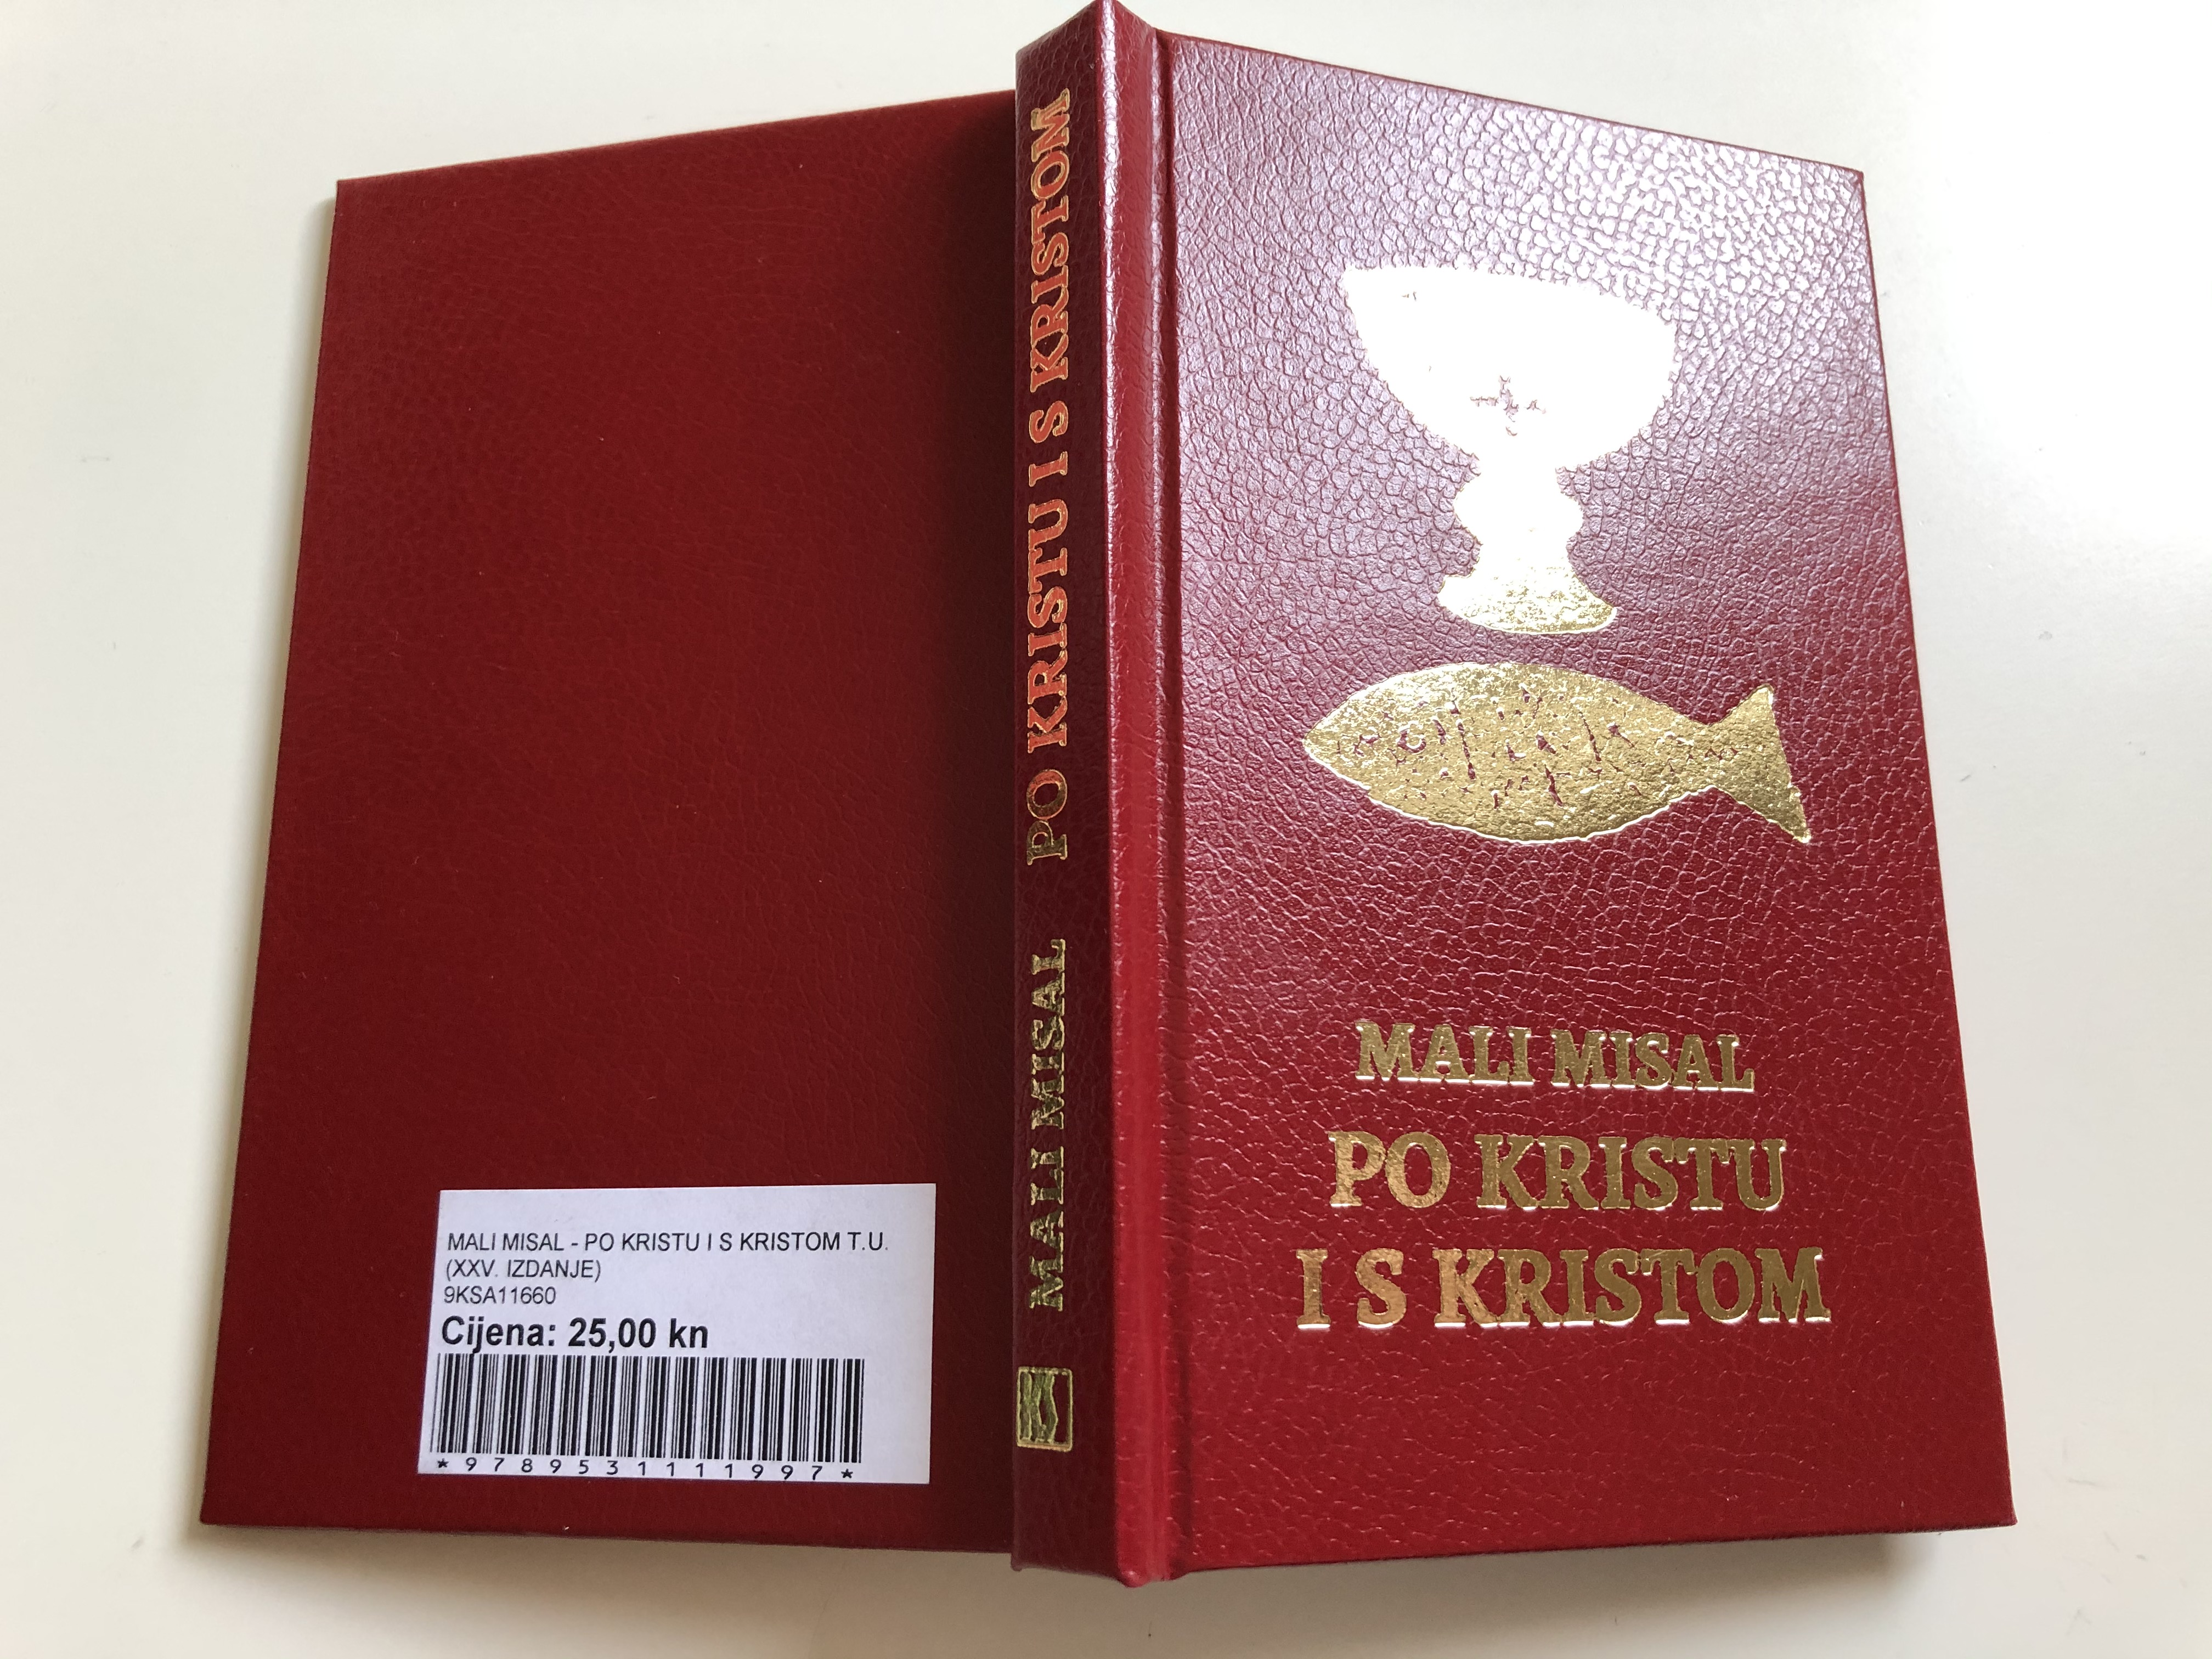 mali-misal-po-kristu-i-s-kristom-croatian-language-catholic-misal-prayer-book-14.jpg